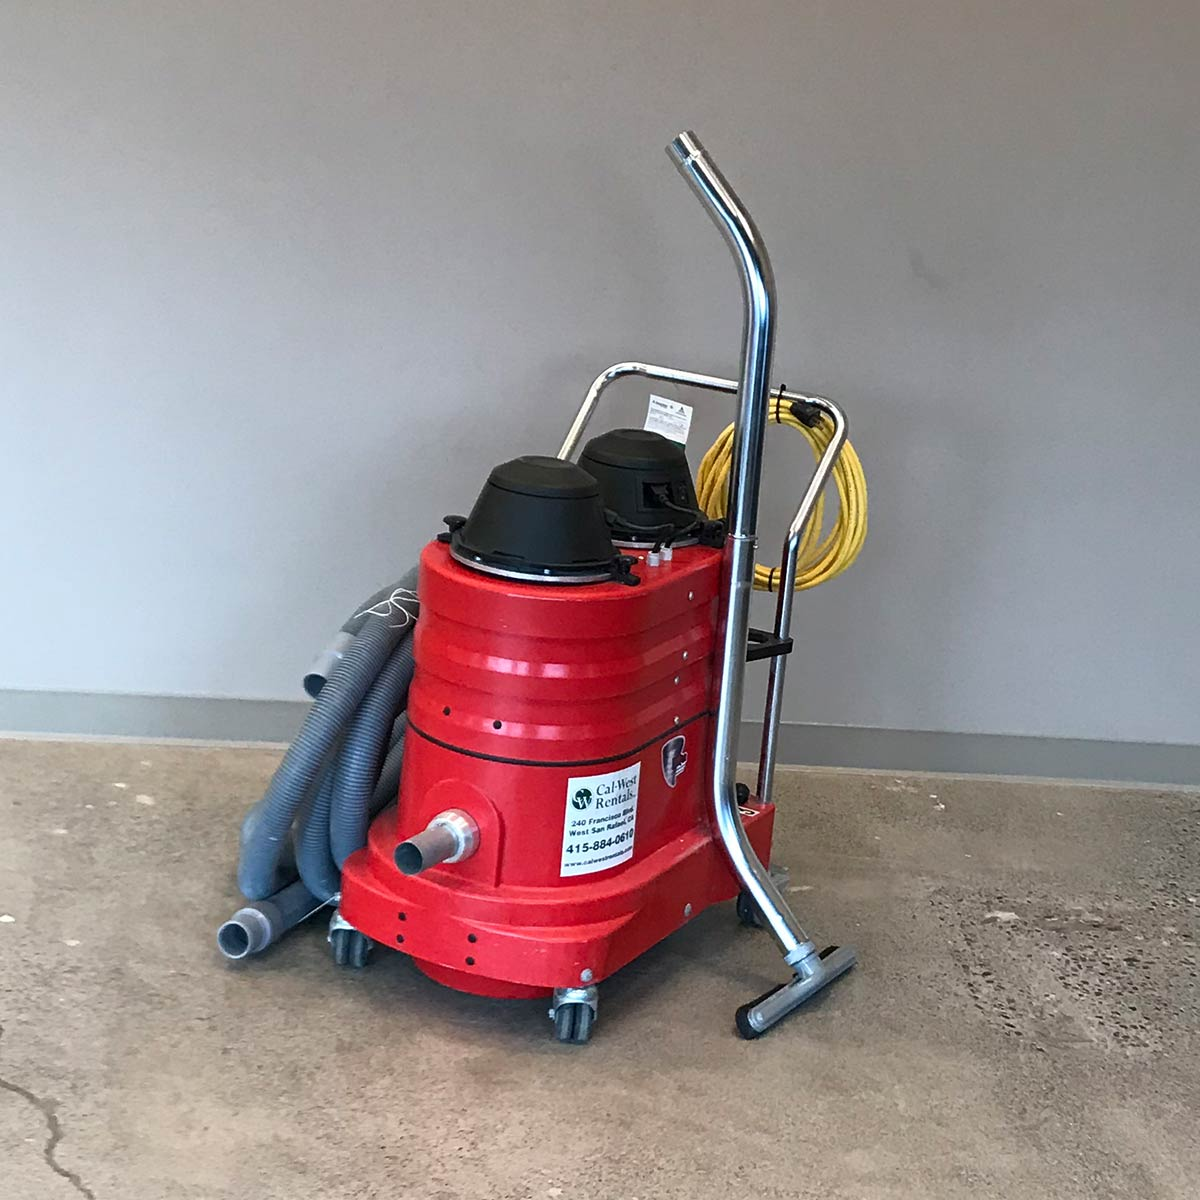 Vacuum, dust collection 200 cfm